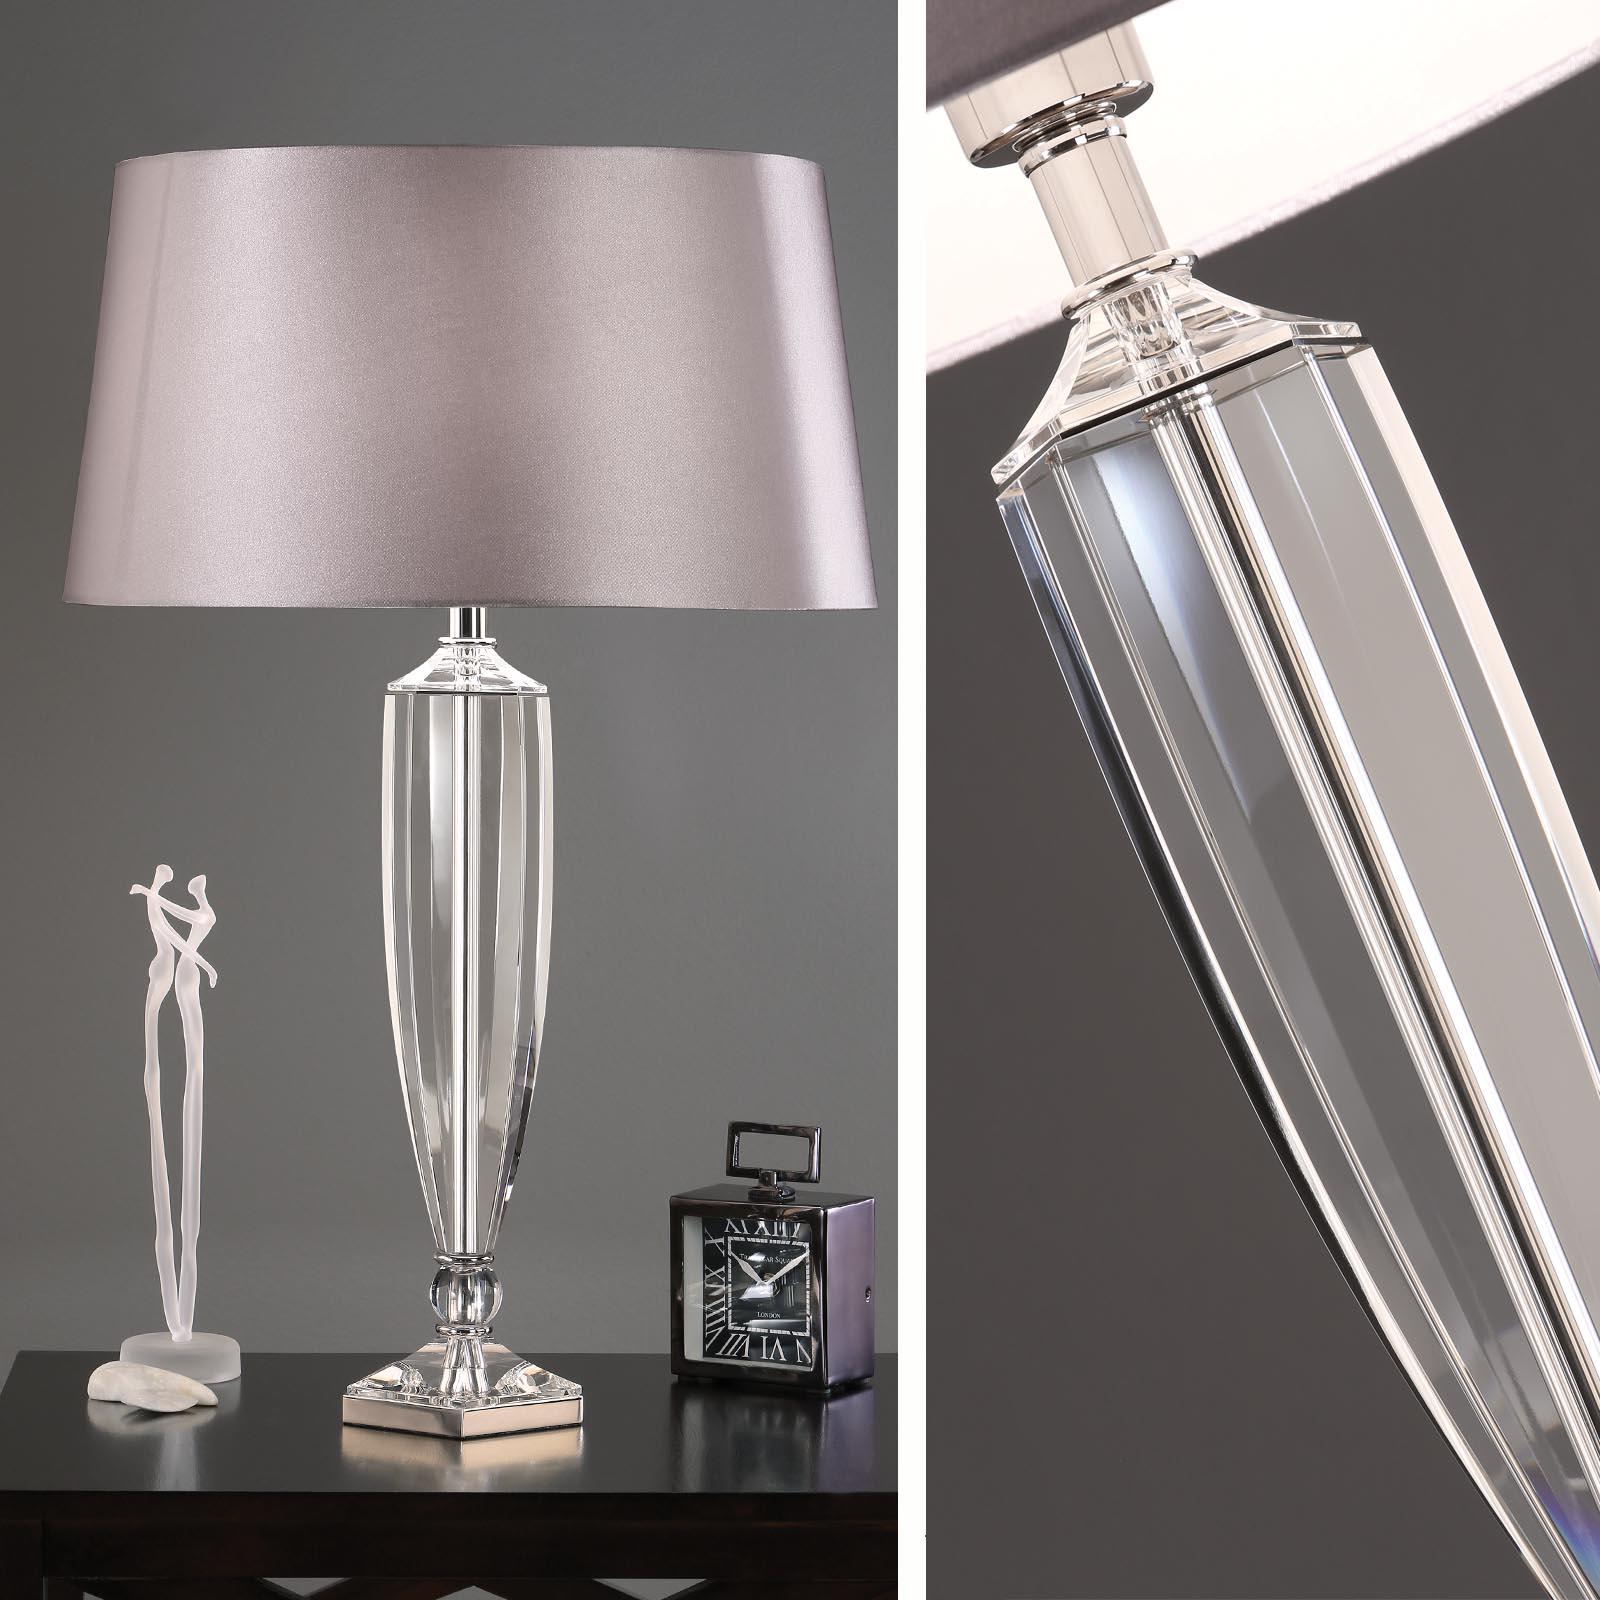 Art Deco Hemmingway Crystal Table Lamp - Grey Shade